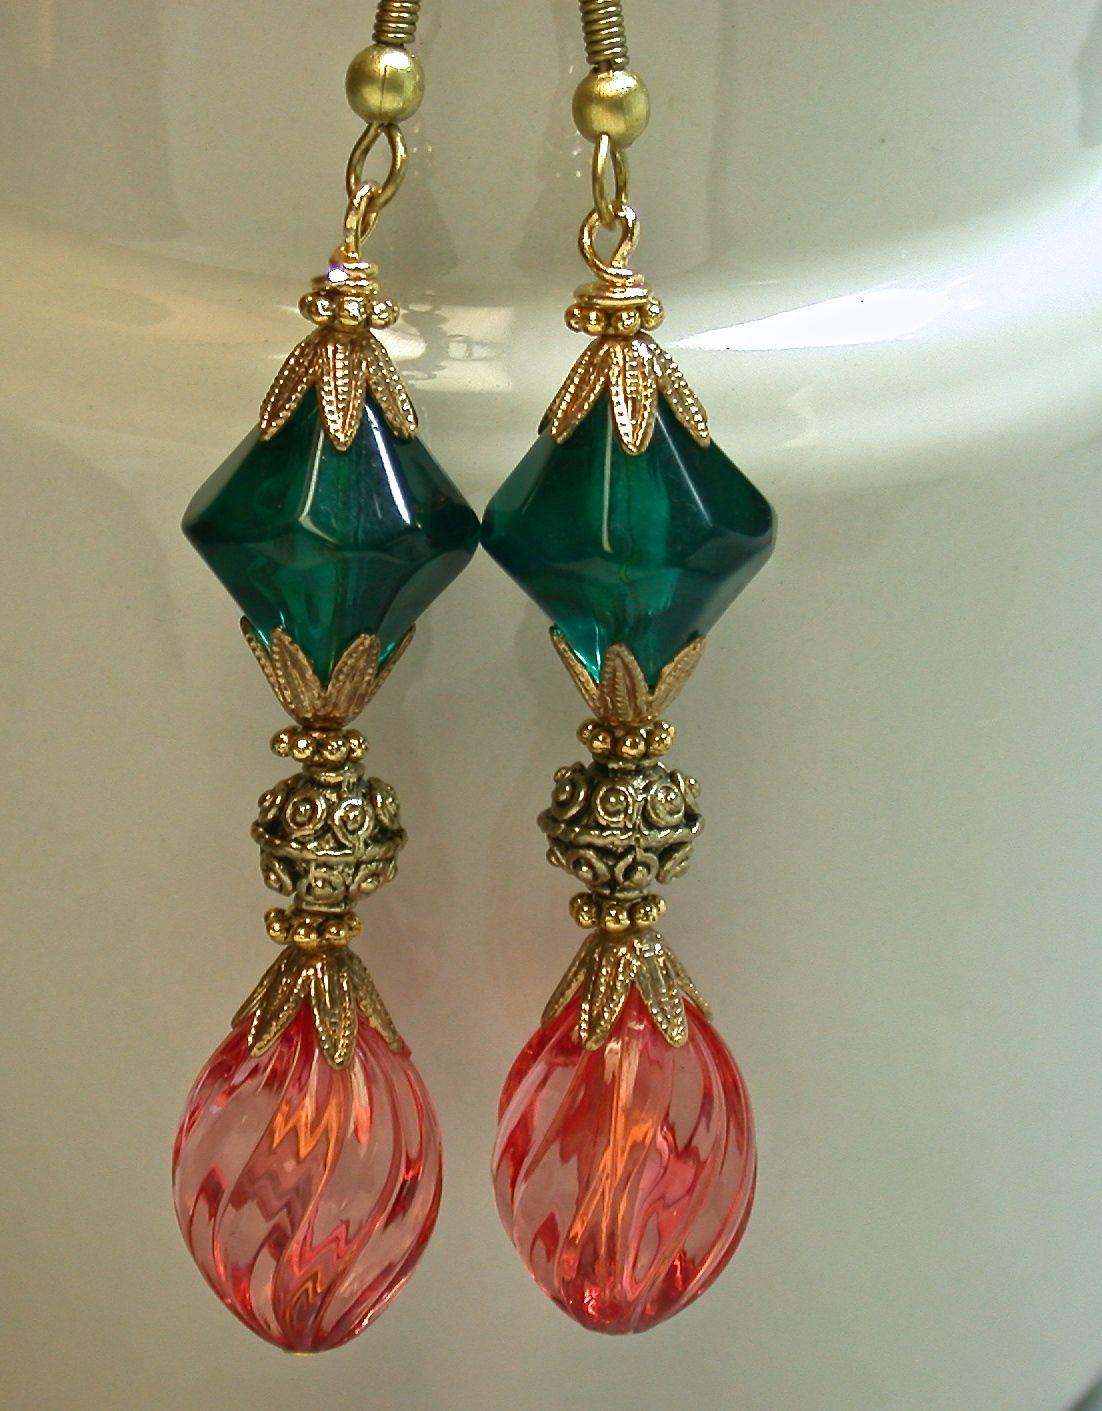 Vintage Japanese Lucite Bead Earrings